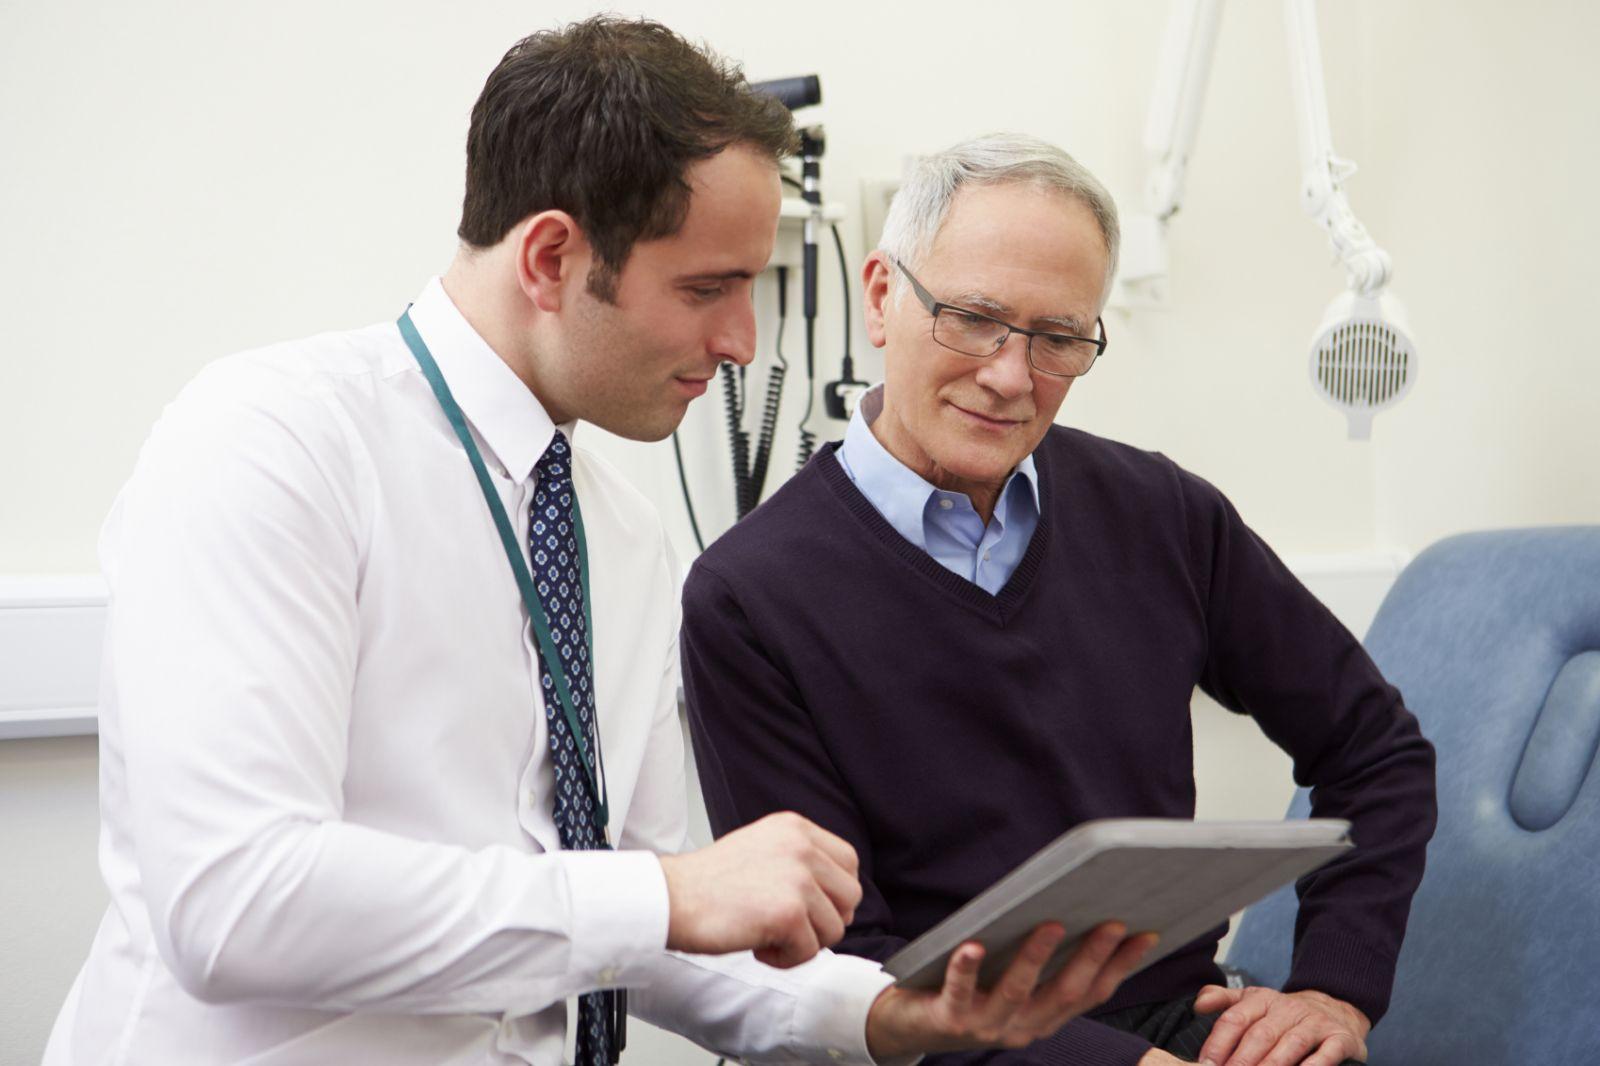 vasectomy prostate cancer